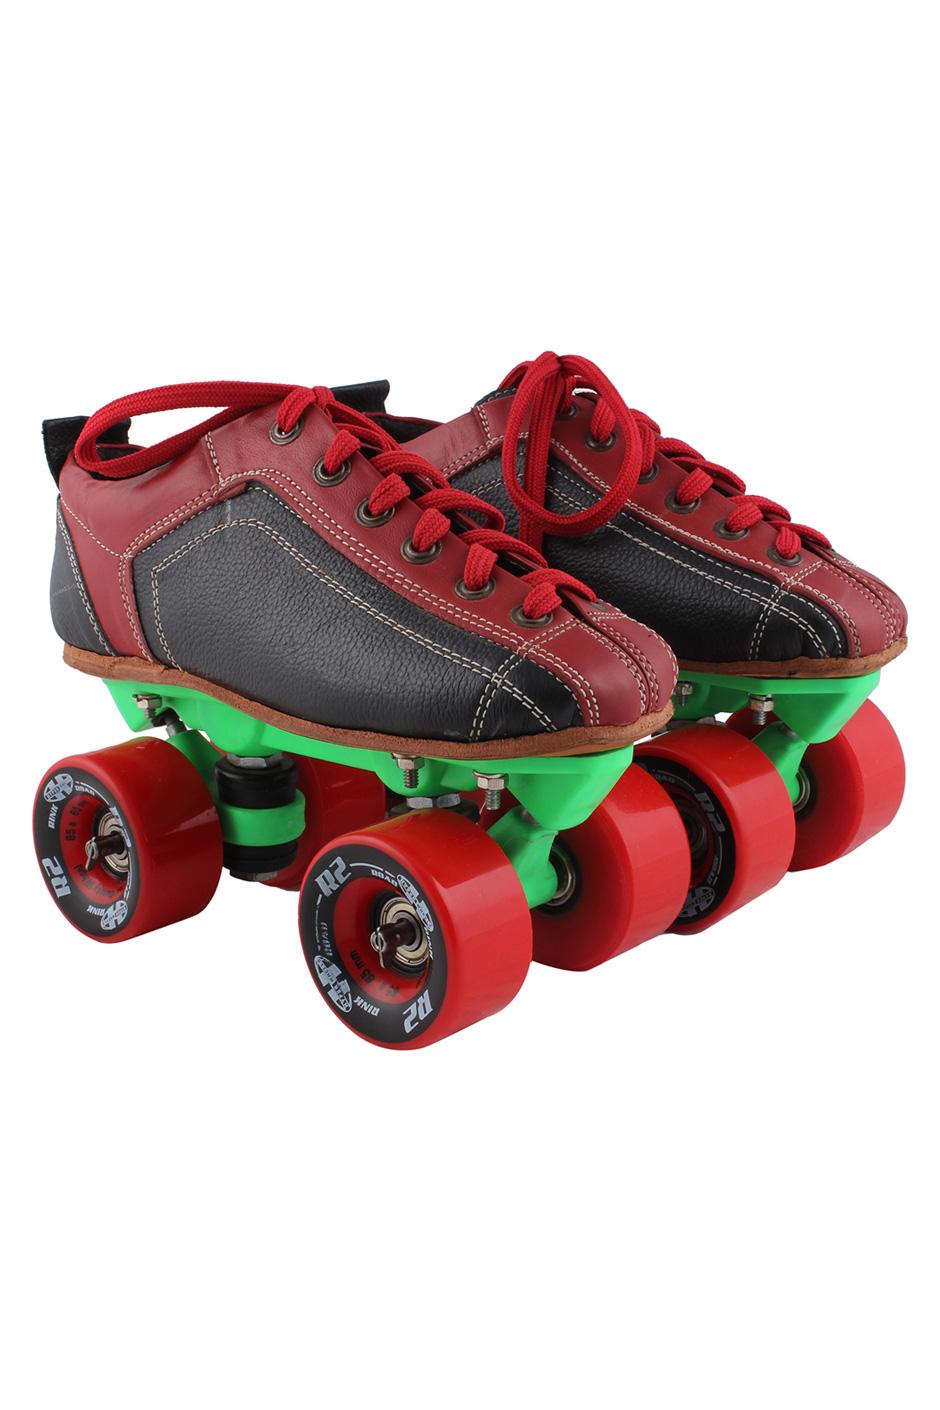 2e7d5c0ea51 Quad Skate Hyper R2 Red